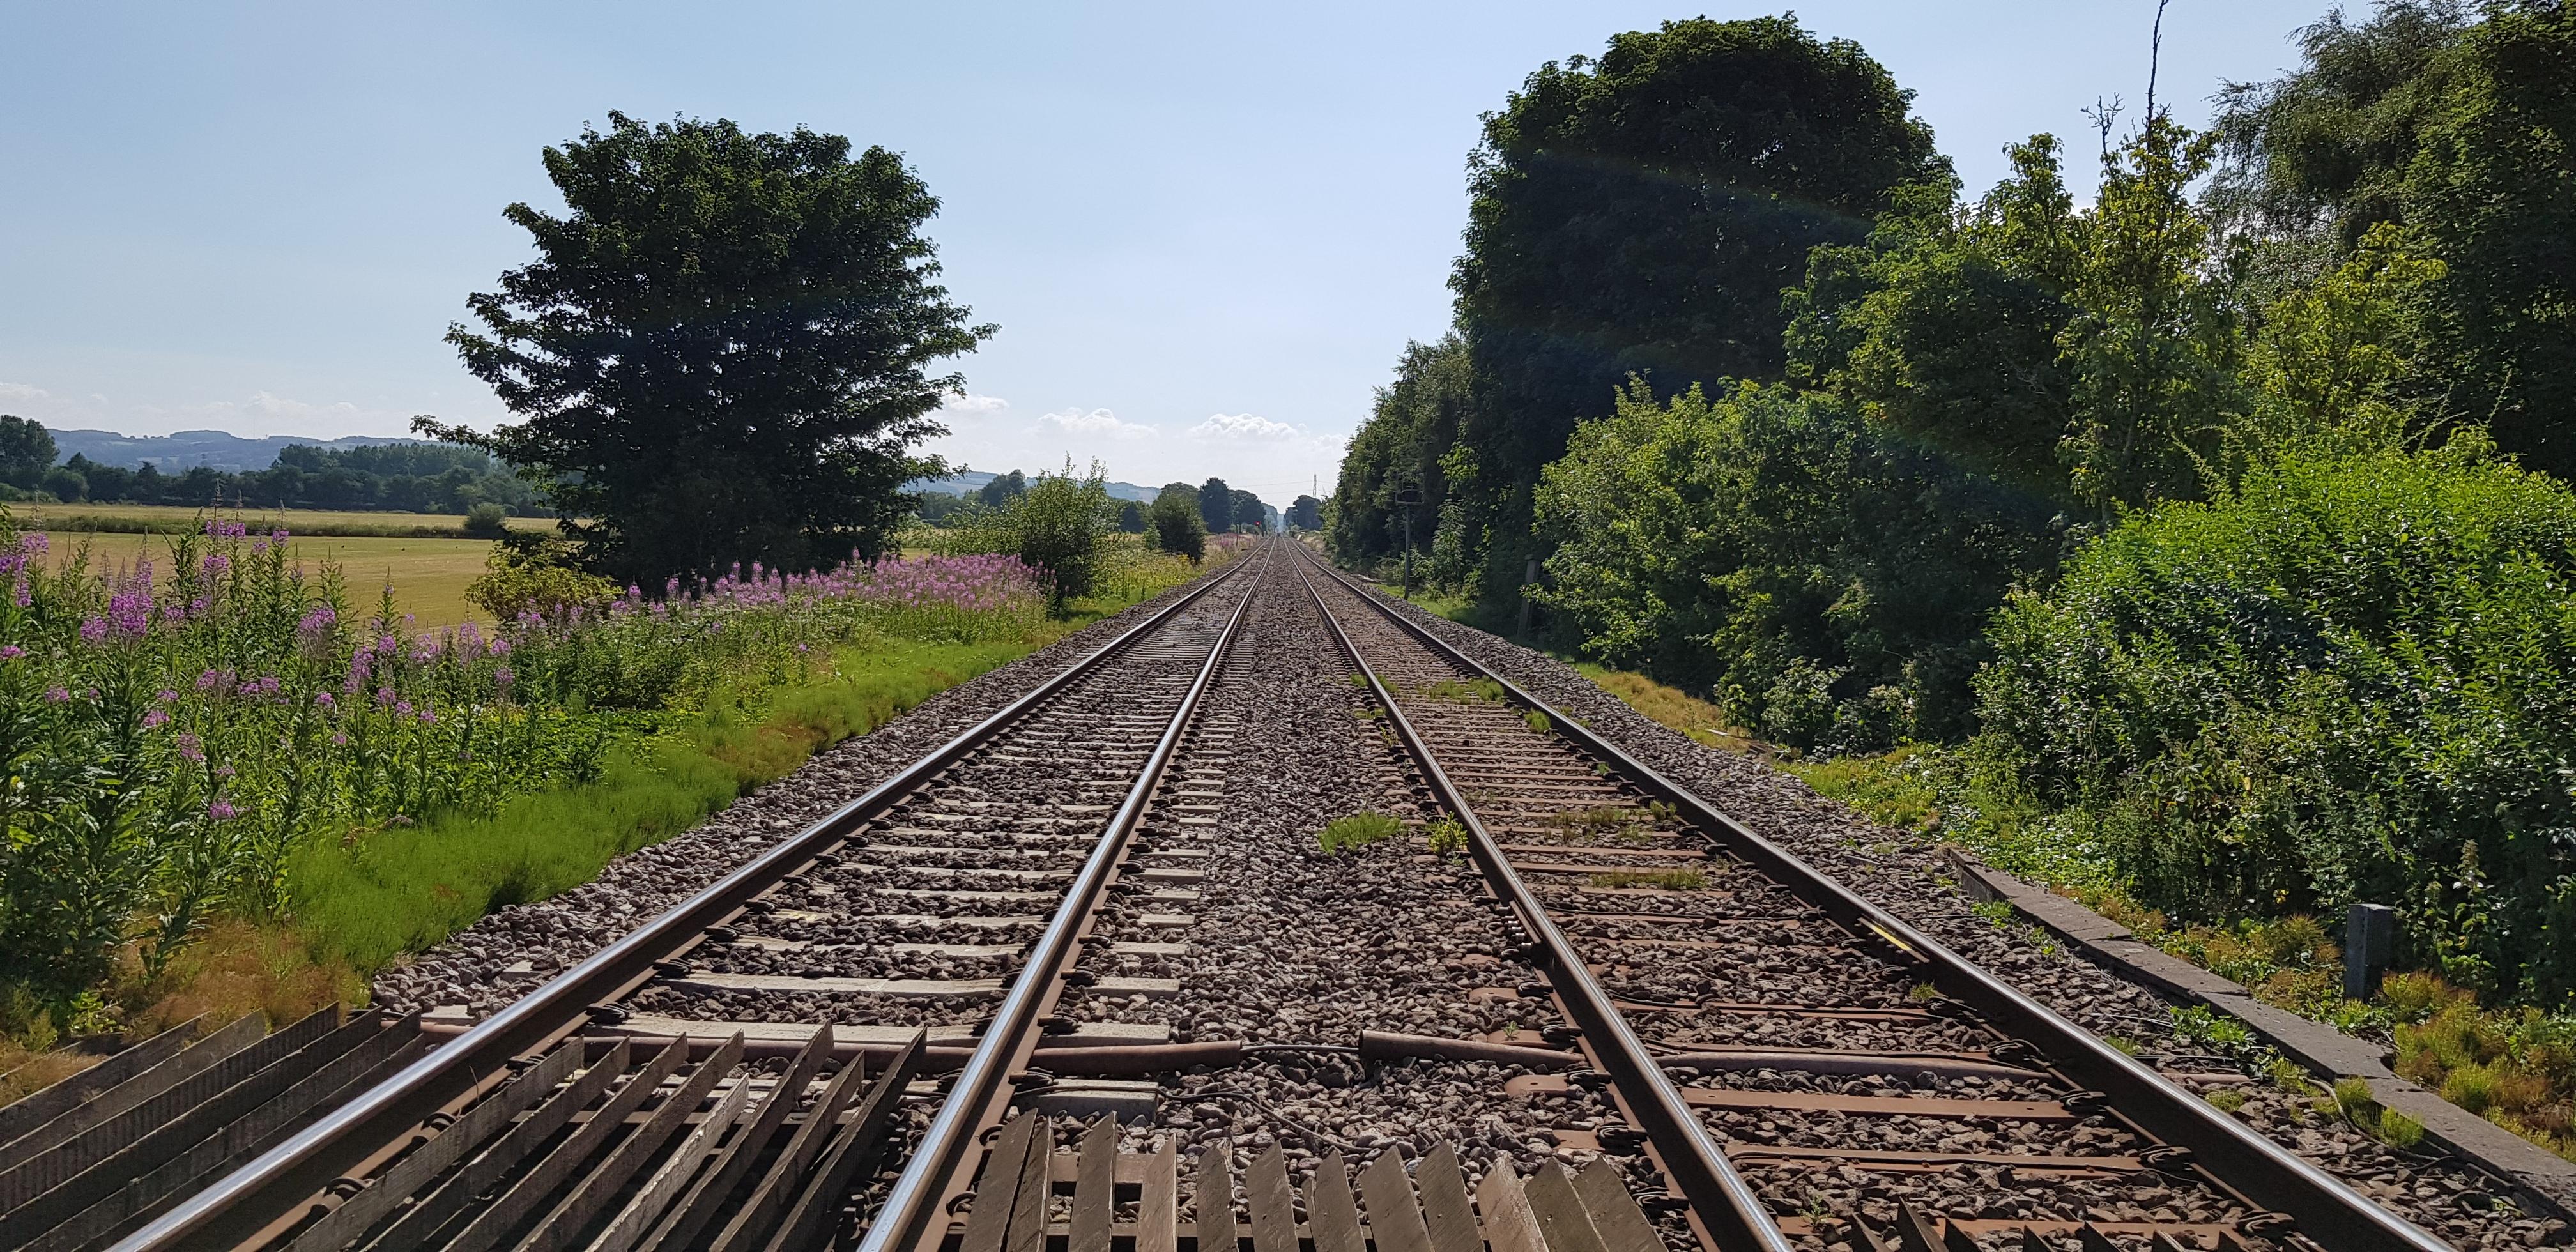 Free Images : railway, tracks, track, rail transport, tree ...